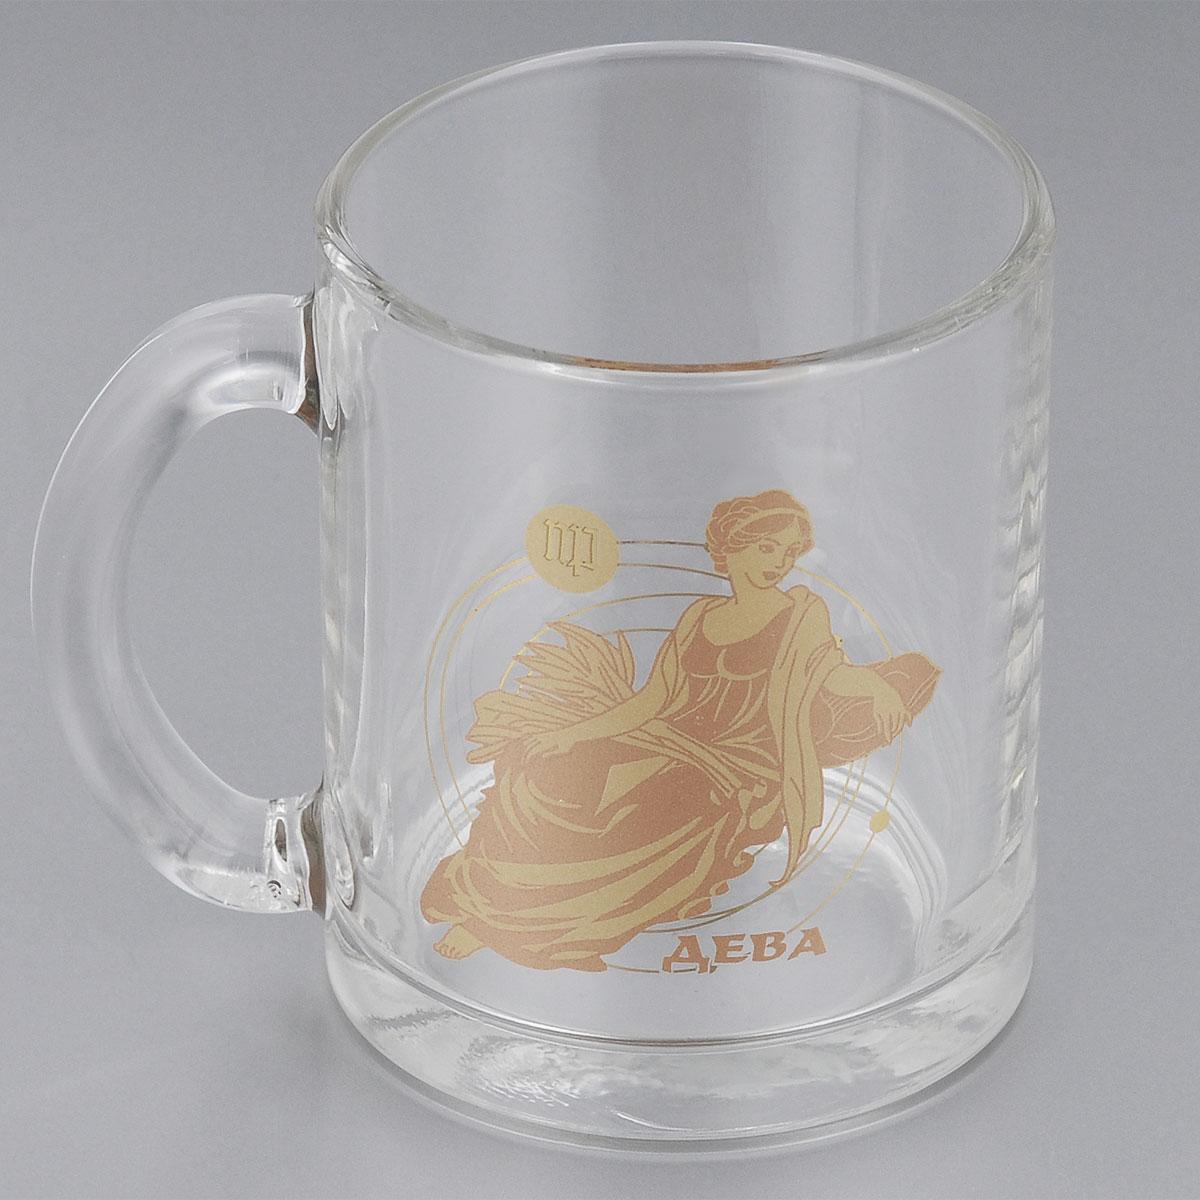 Кружка чайная ОСЗ Знаки зодиака. Дева, 330 мл кружка фарфор вербилок знаки зодиака 250 мл